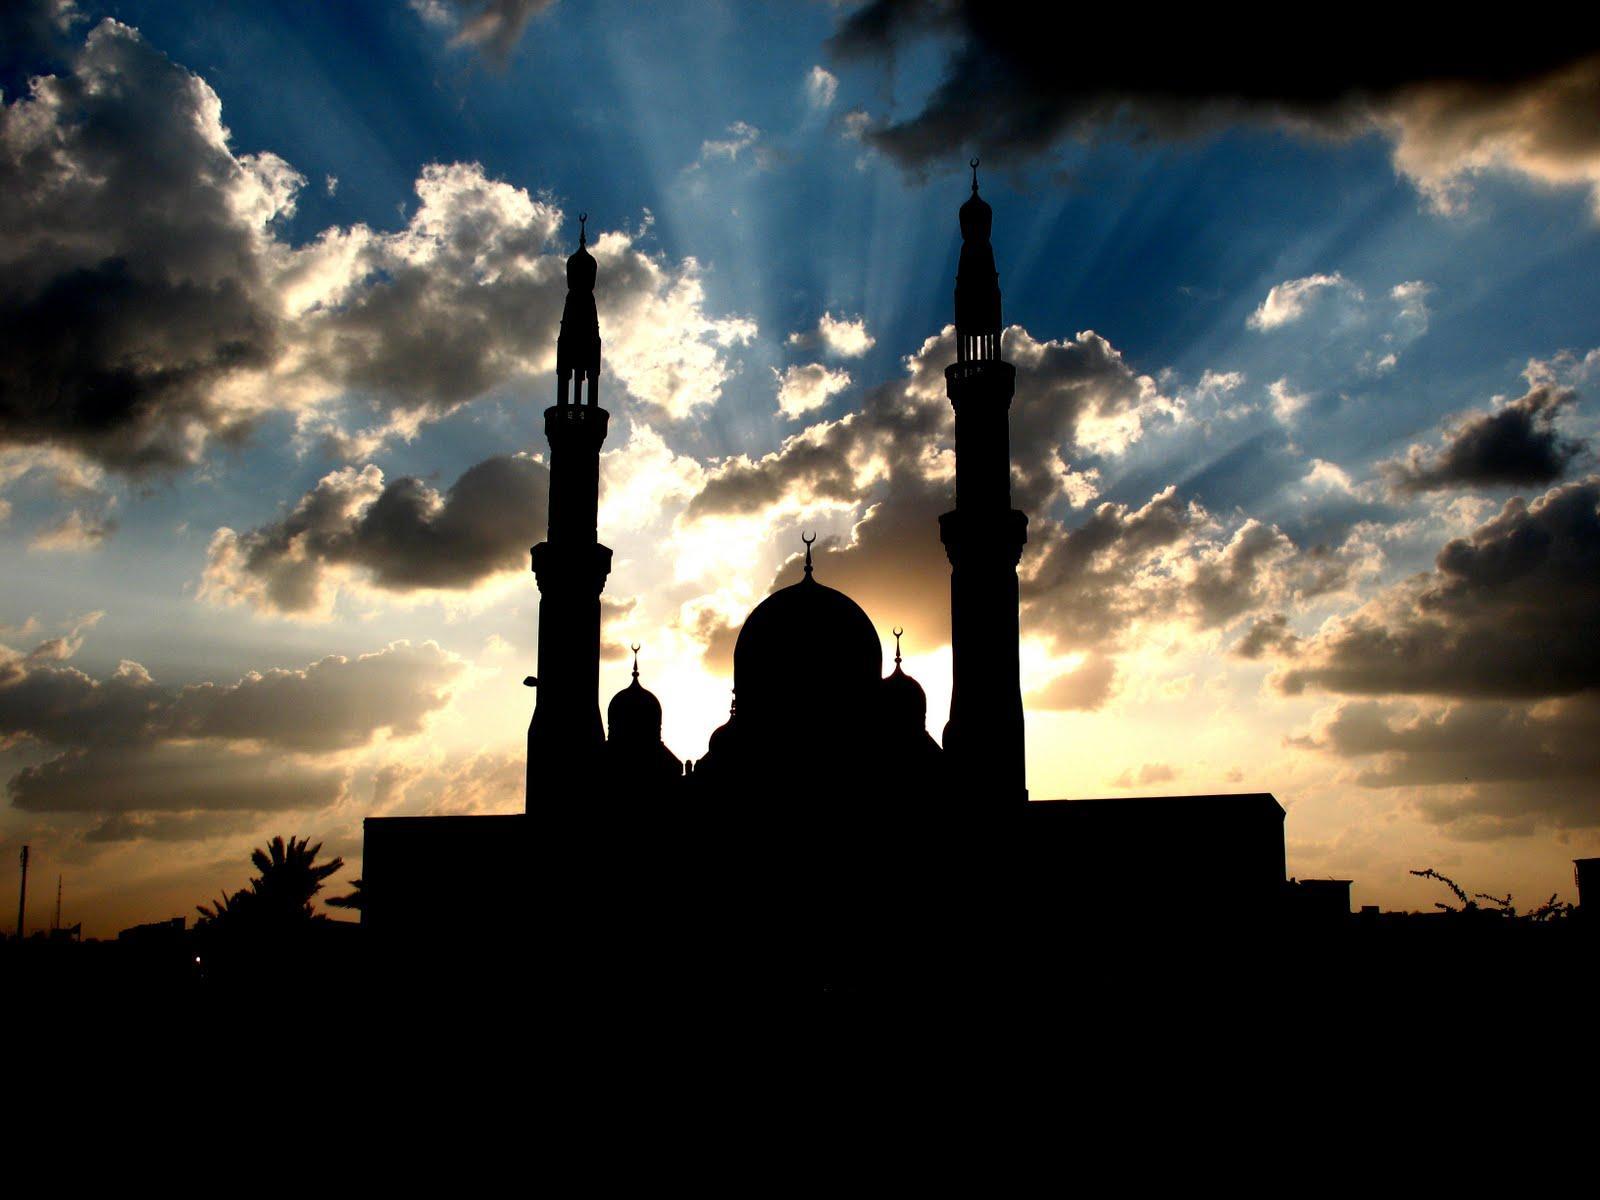 Islamic History And Islamic Wallpaper: New Islamic Mosque